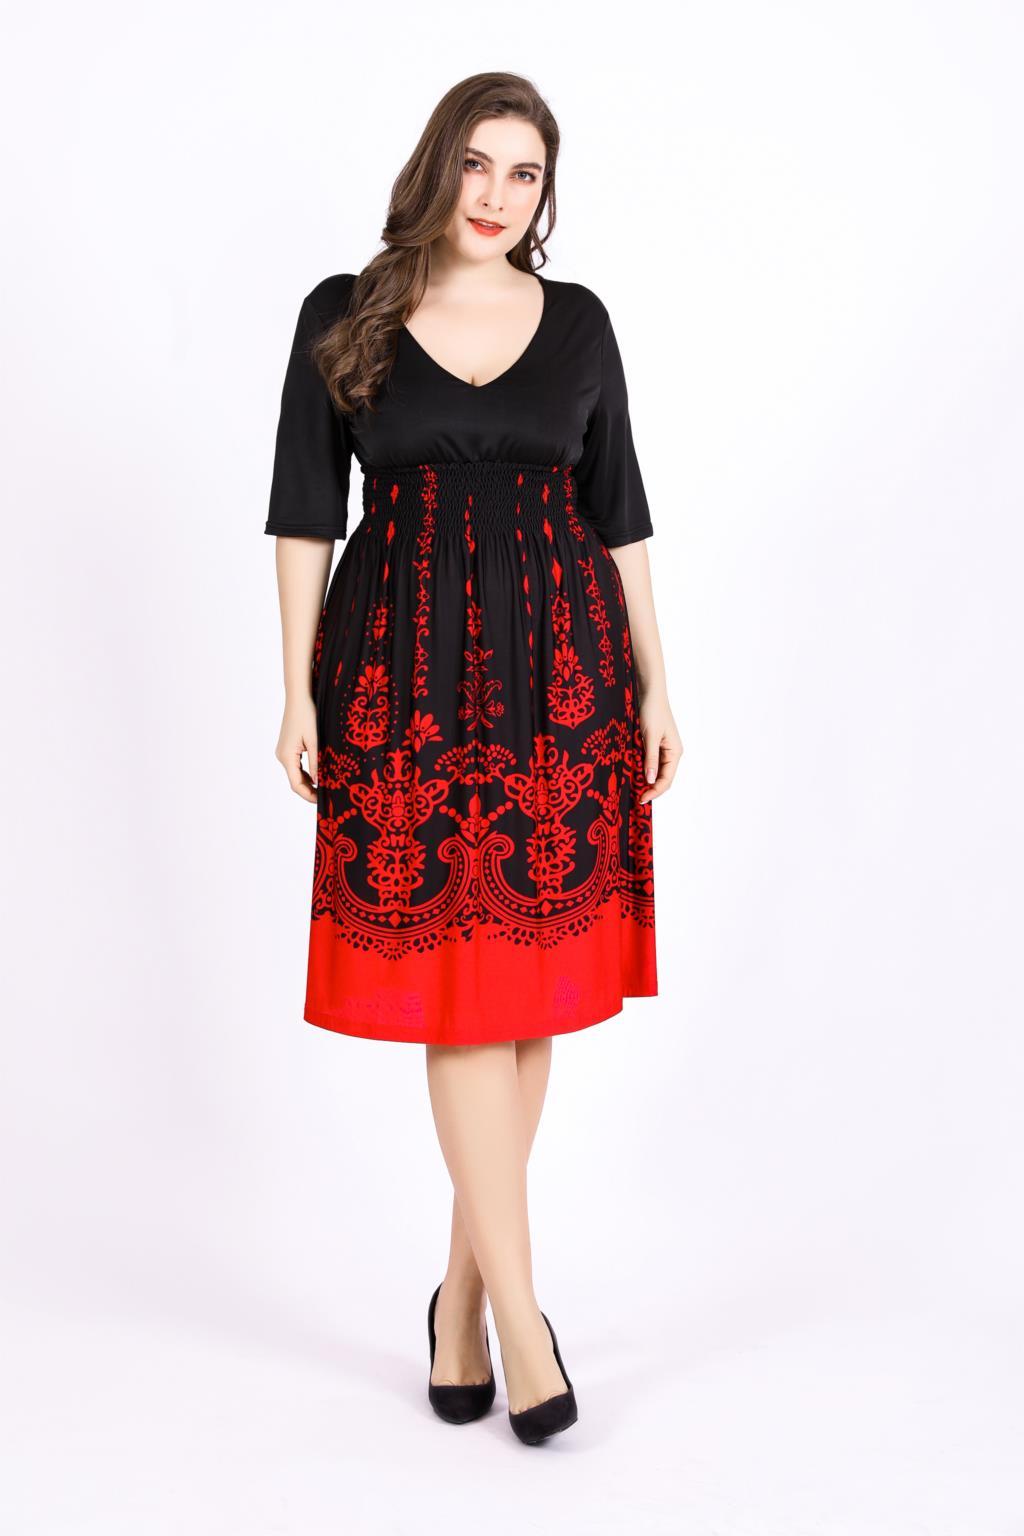 Women Dresses Plus Size 5xl 6xl Summer Ladies V Neck Half Sleeve High Waist  Casual Midi Dress Floral Print Tunic Party Dresses bca1b908376c